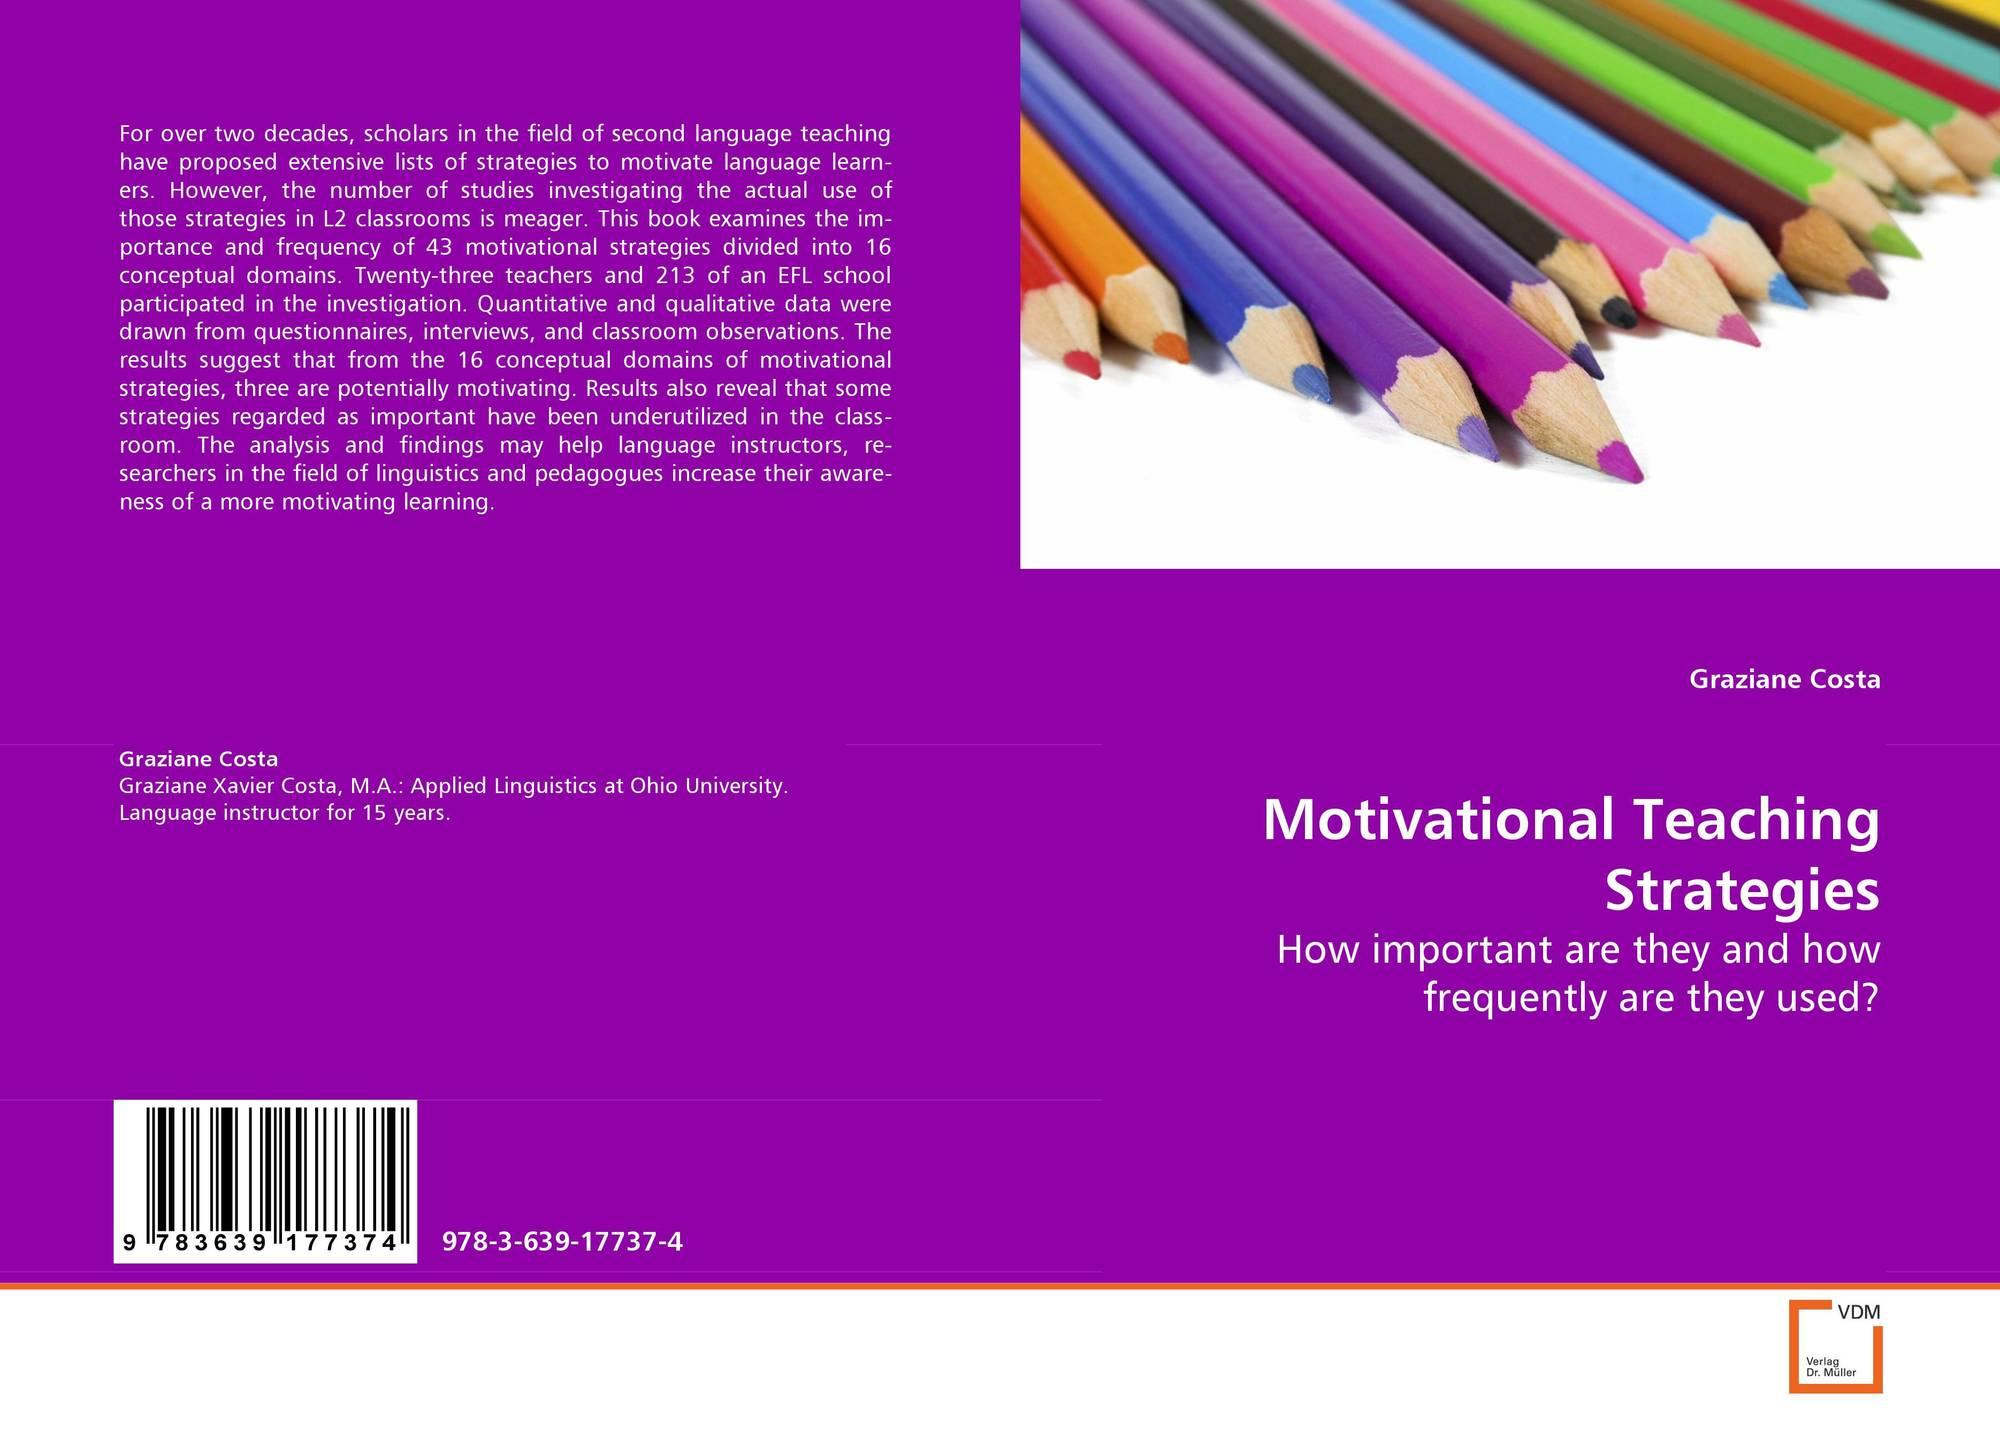 motivational strategies in language classroom anang - HD2000×1454